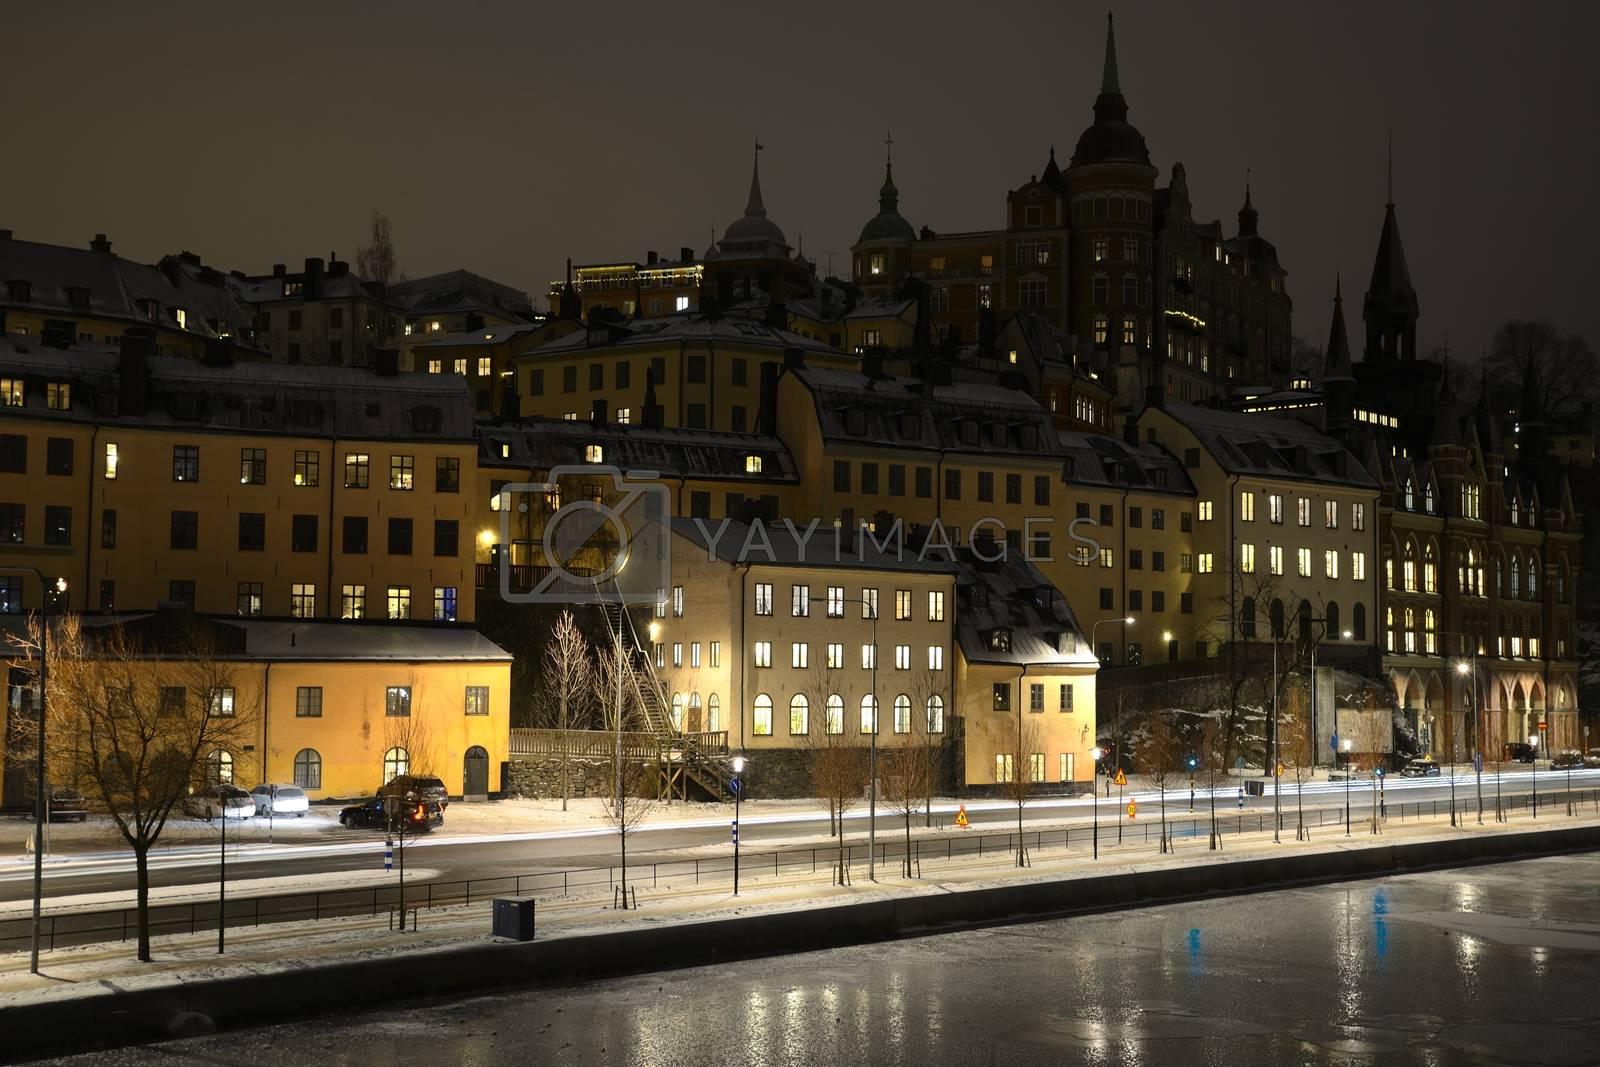 Stockholm embankment at night.